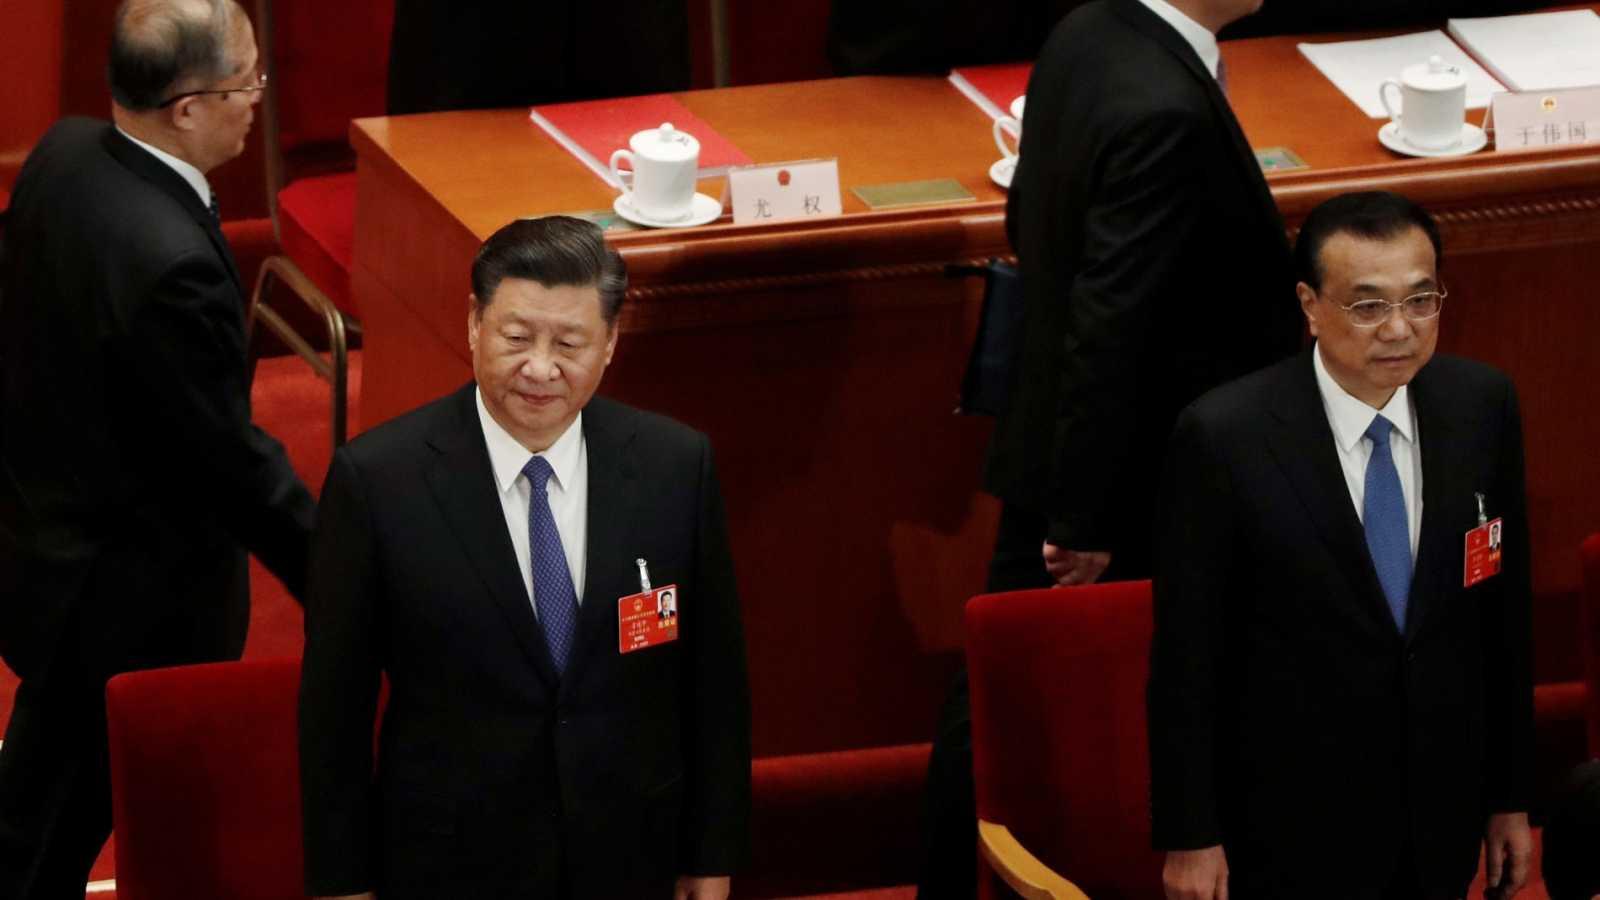 El presidente chino, Xi Jinping y el primer ministro Li Keqiang, en la Asamblea Nacional Popular de China, en Beijing.